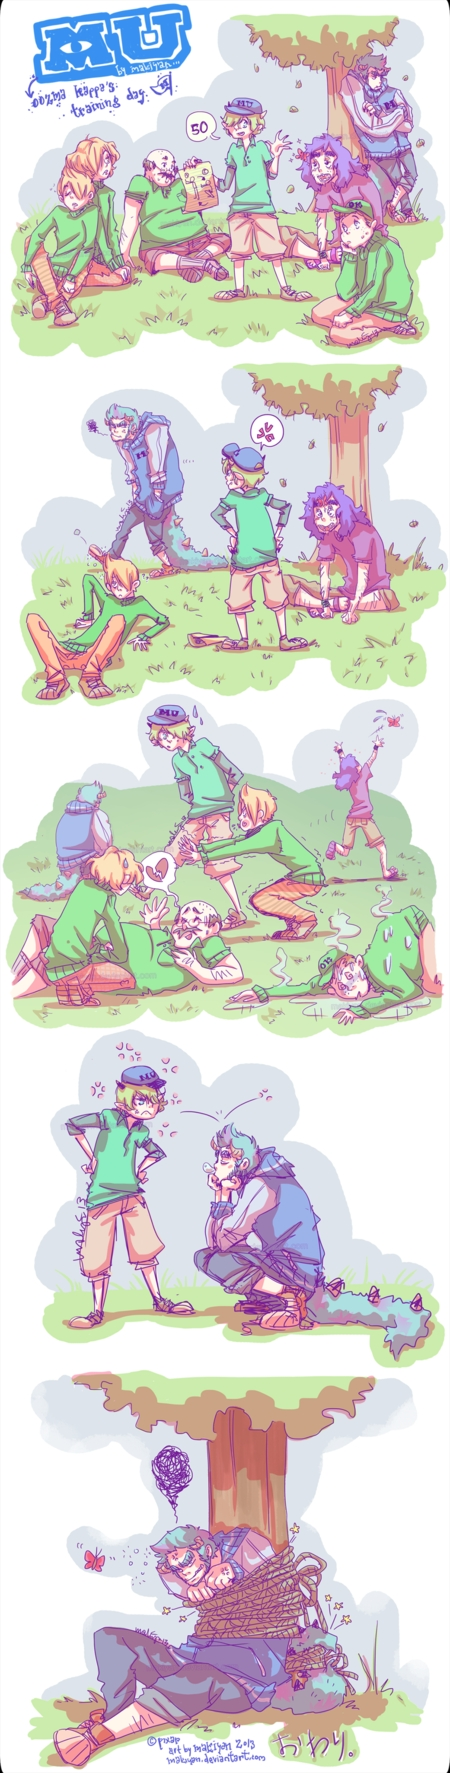 Scott Squishy Squibbles Monsters University Zerochan Anime Image Board